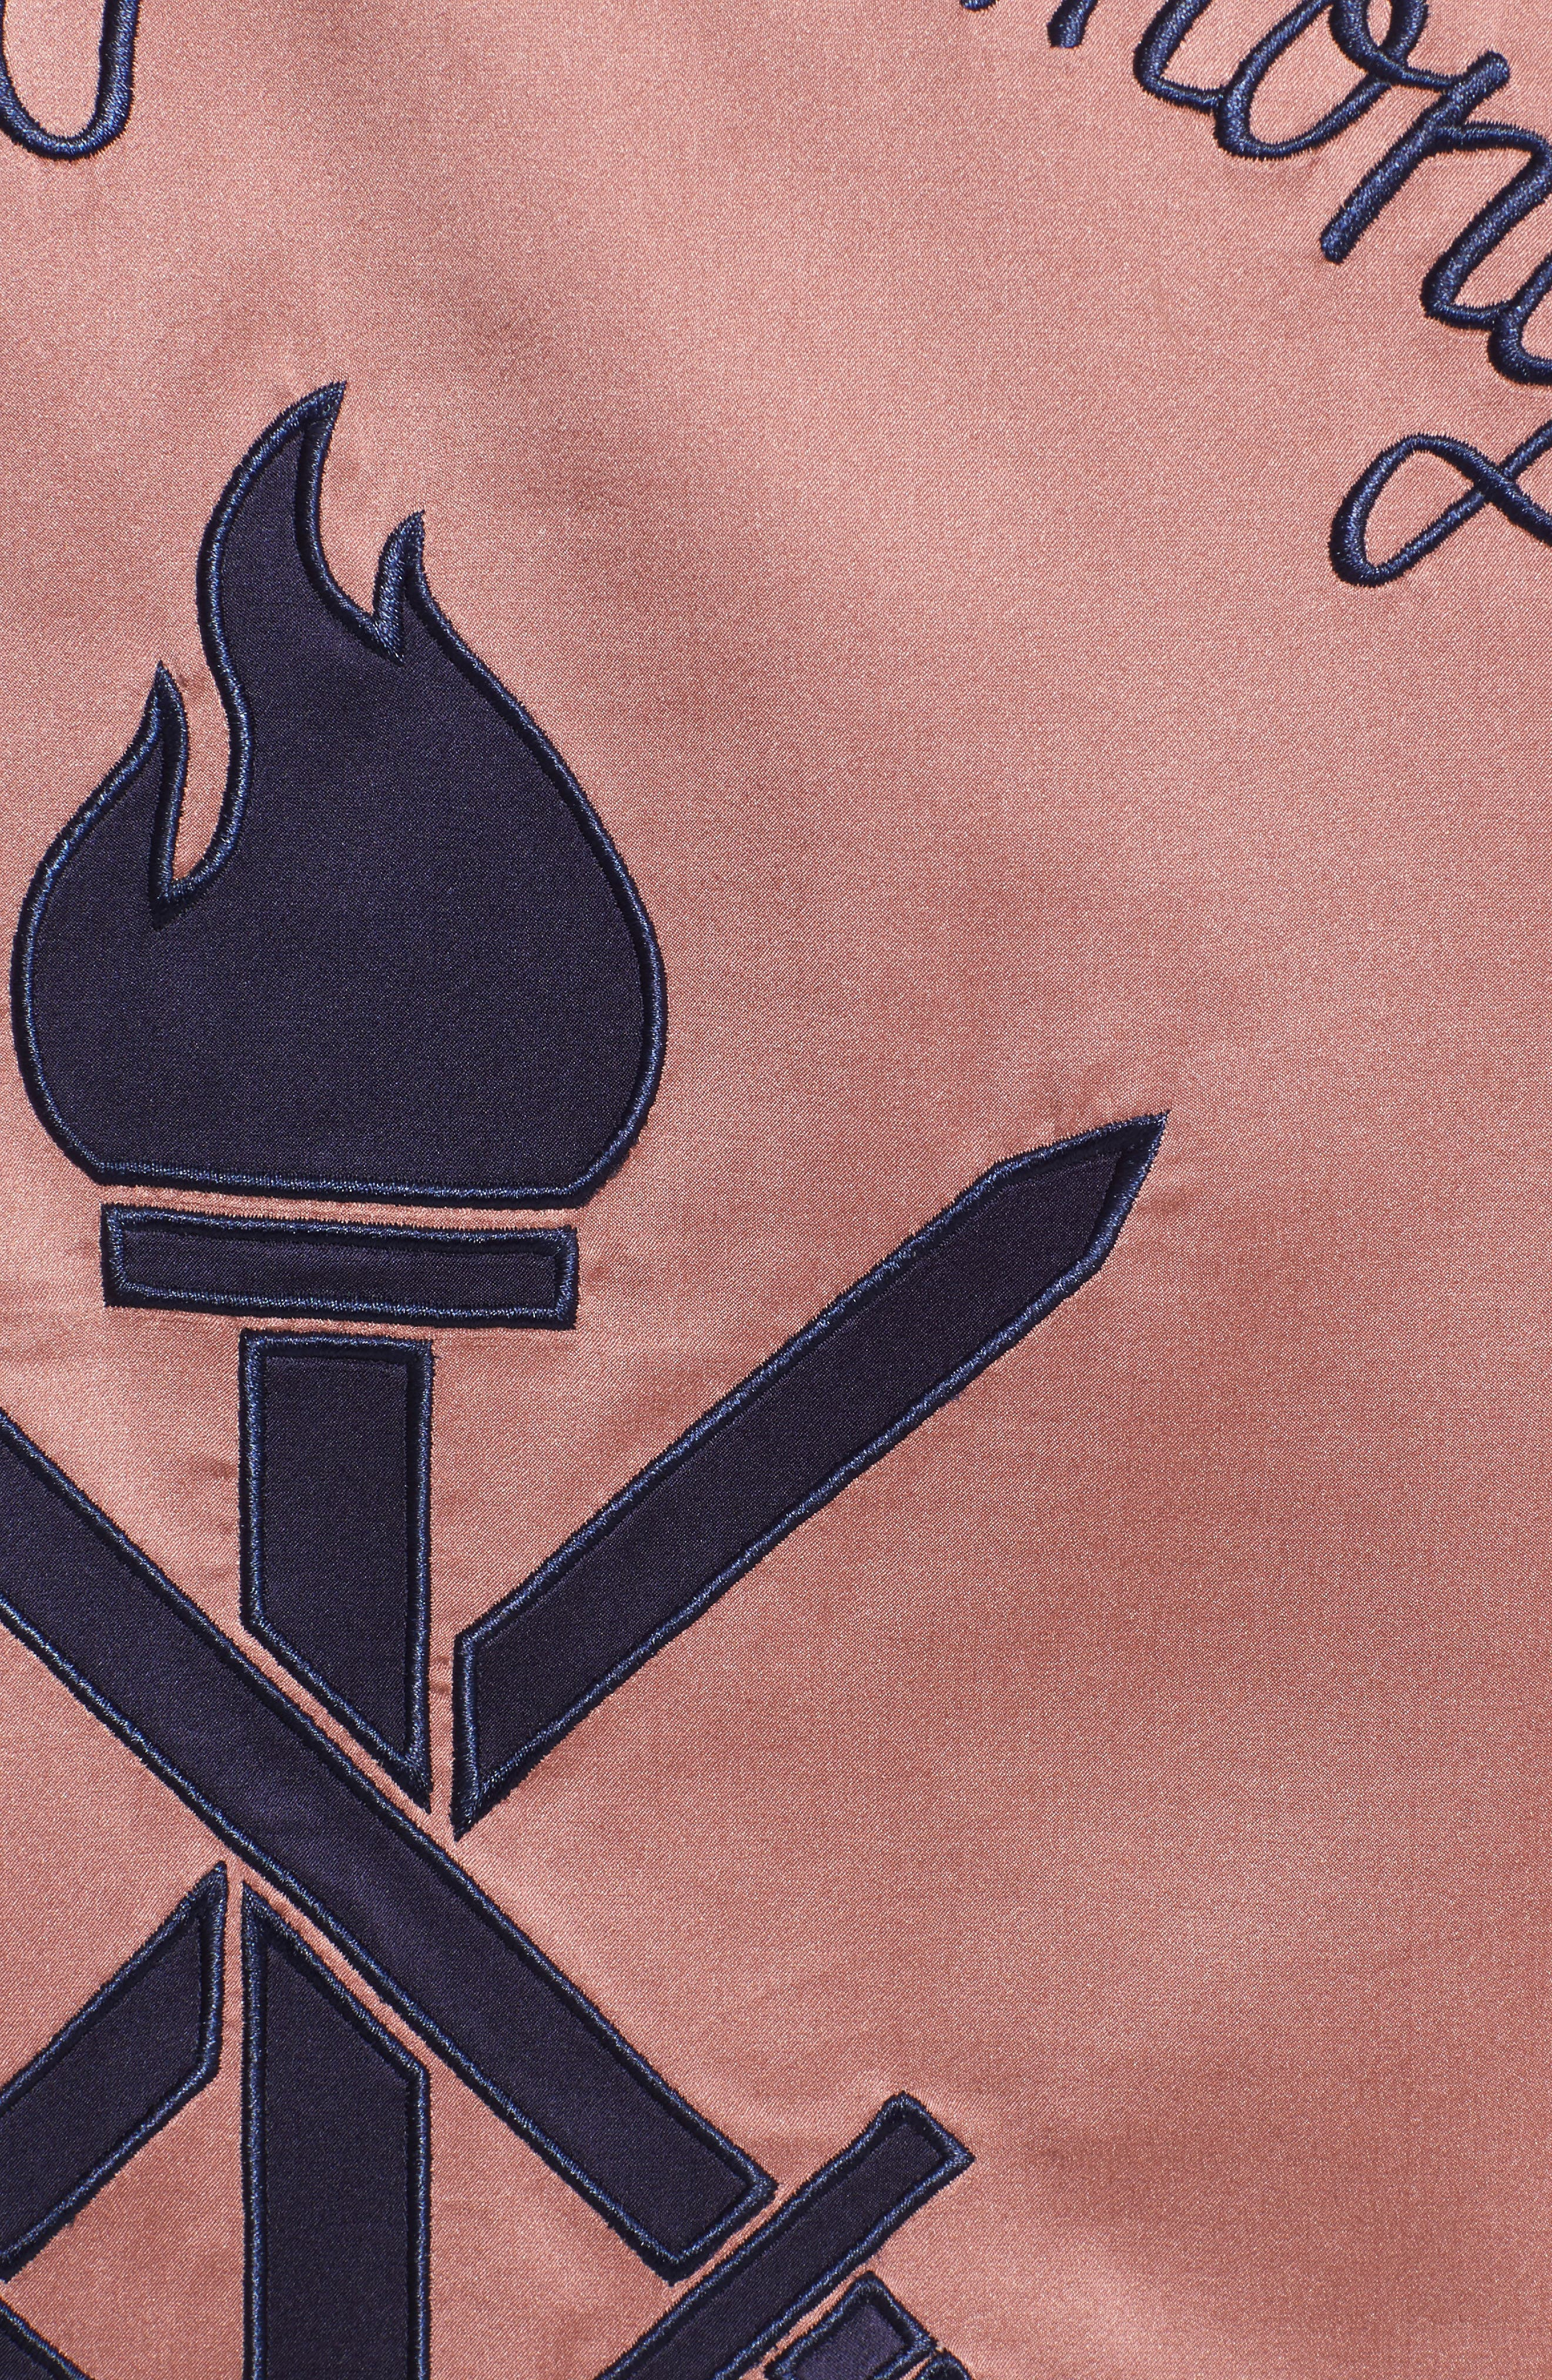 Reversible Silk Bomber Jacket,                             Alternate thumbnail 7, color,                             695